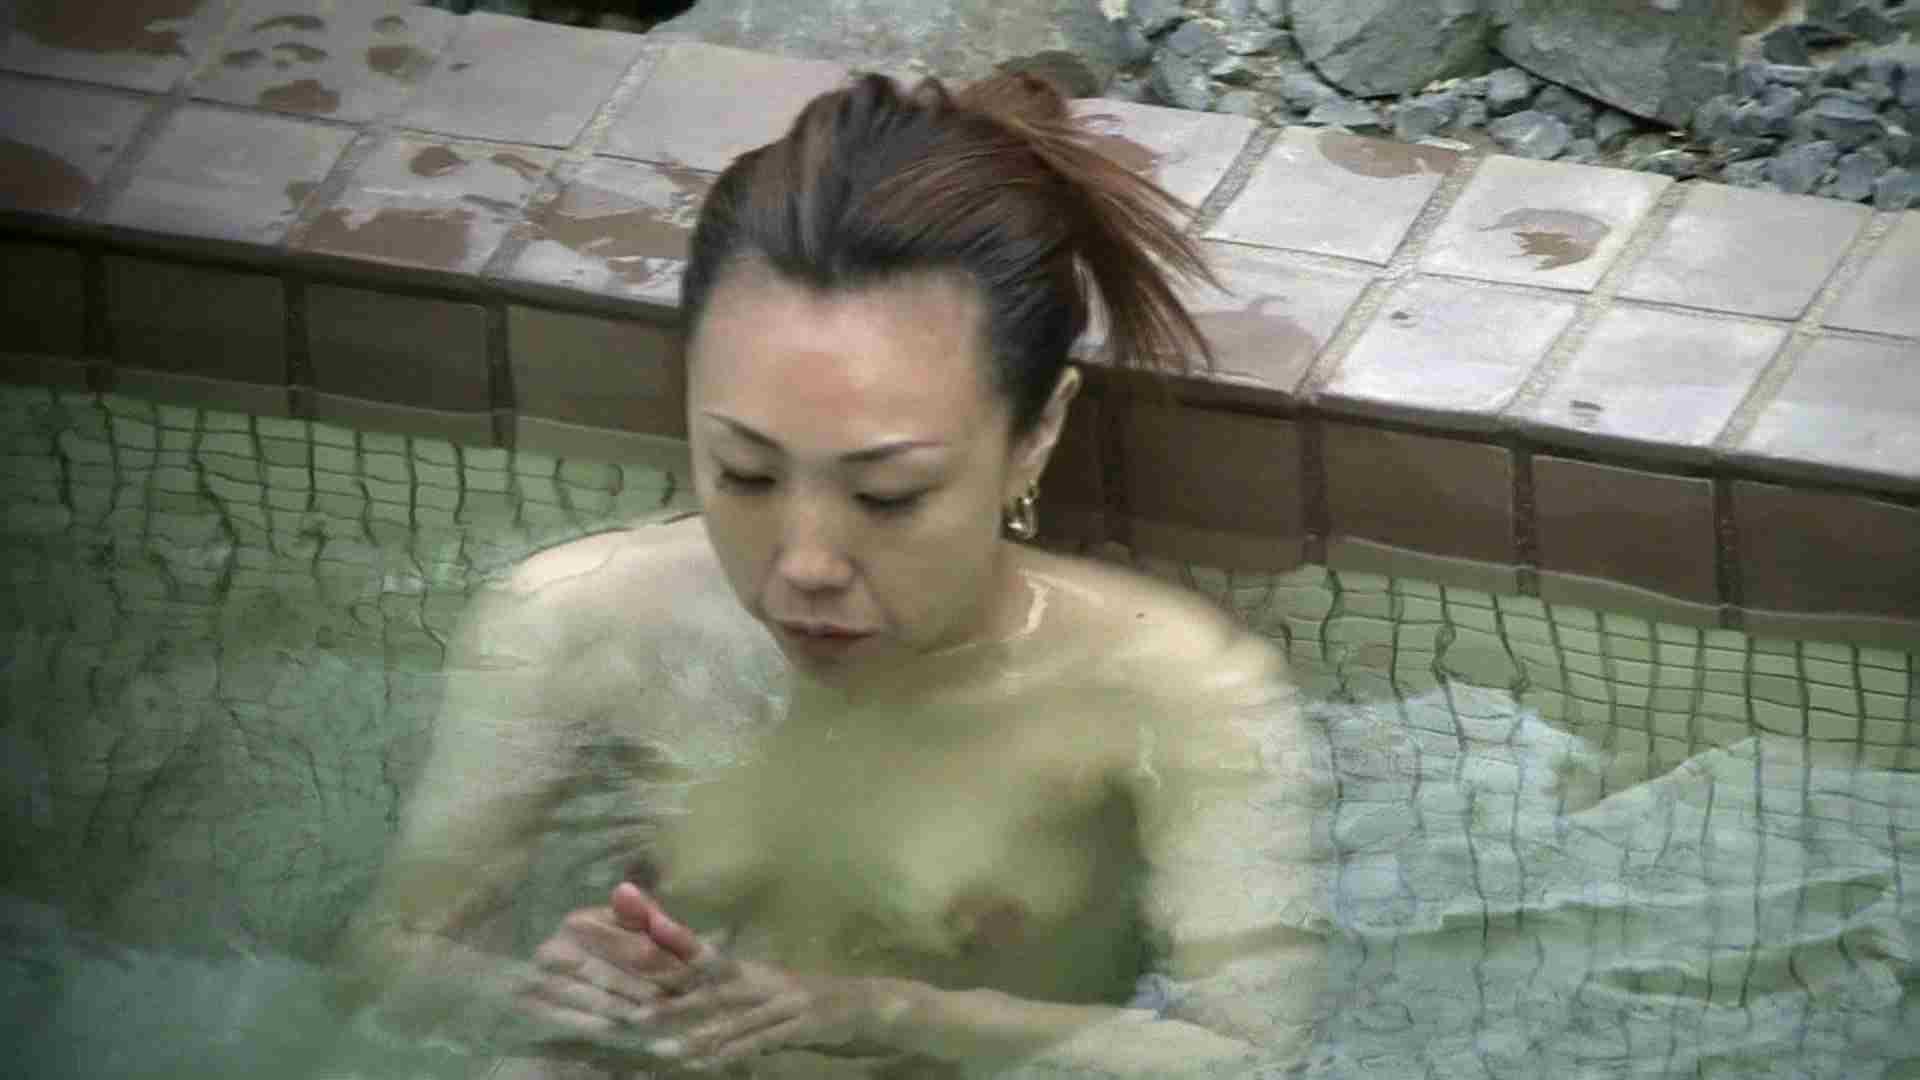 Aquaな露天風呂Vol.654 露天 盗撮われめAV動画紹介 87連発 32